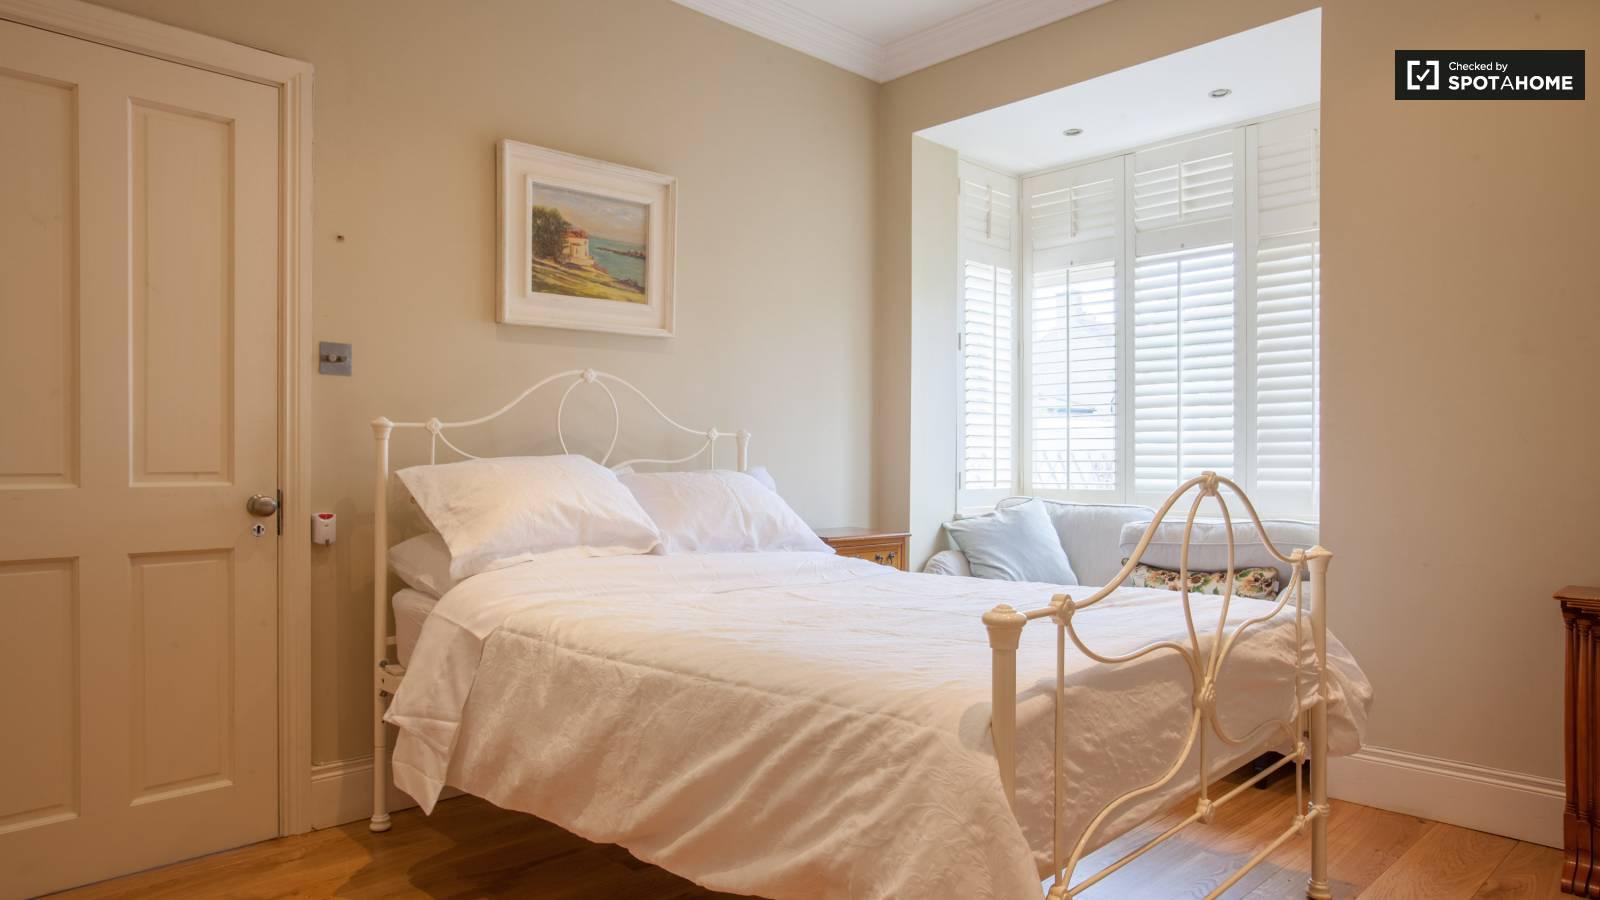 Studio apartment for rent in Sandycove, Dublin